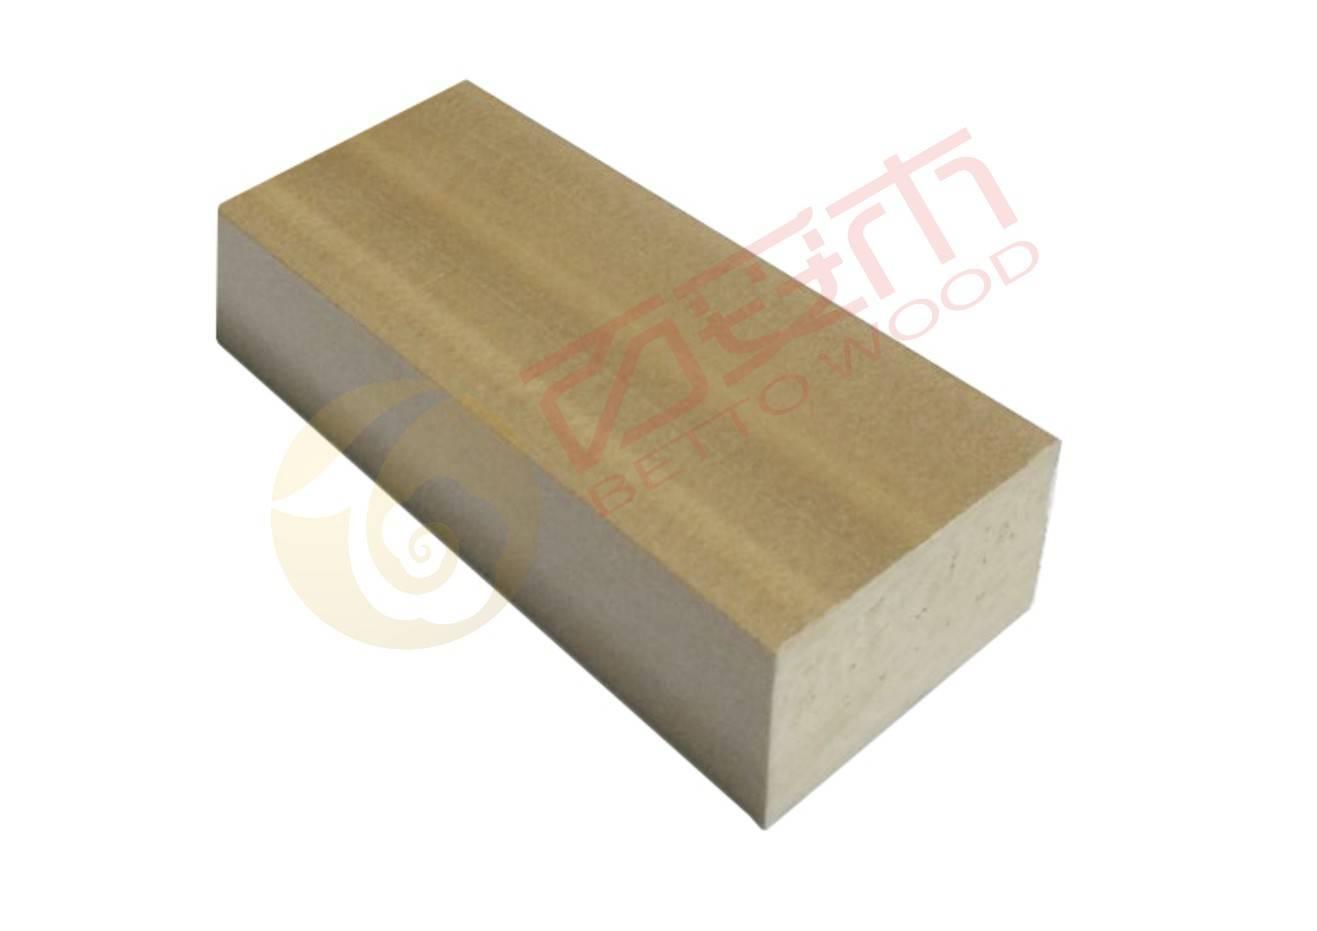 decking joist water proof rowood plastic composites t resistance keel